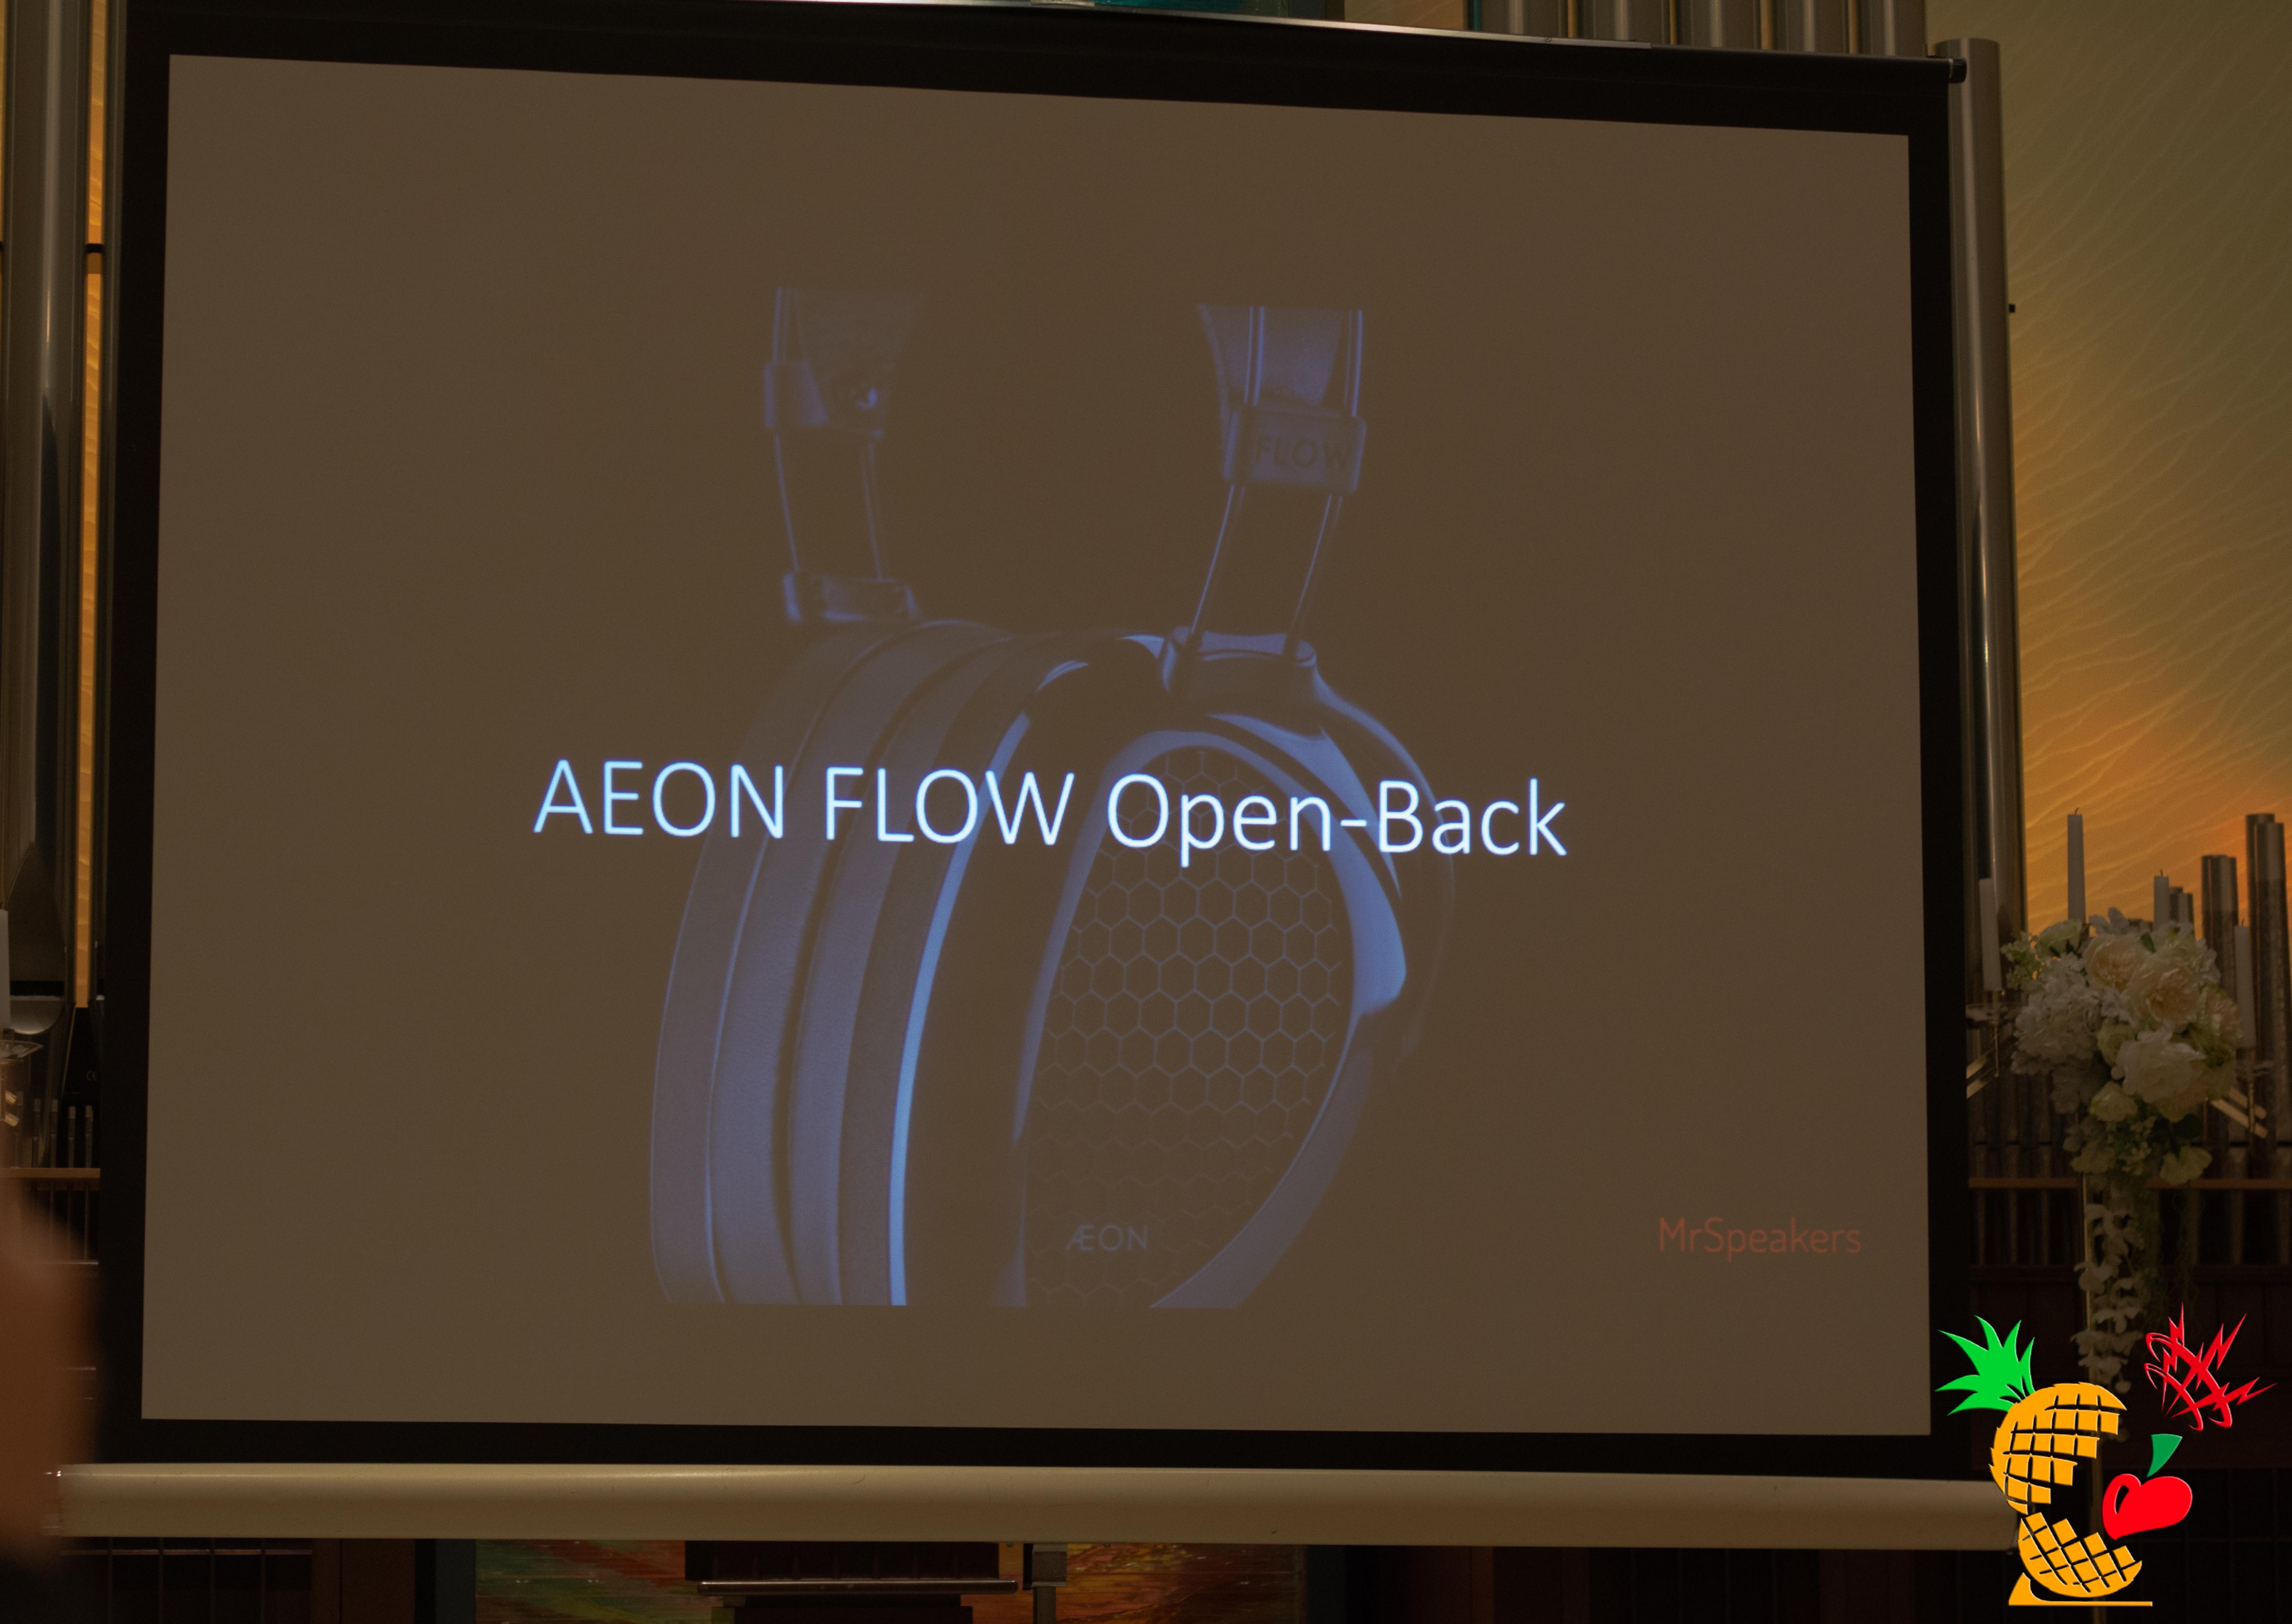 MrSpeakers AEON FLOW Open - Back